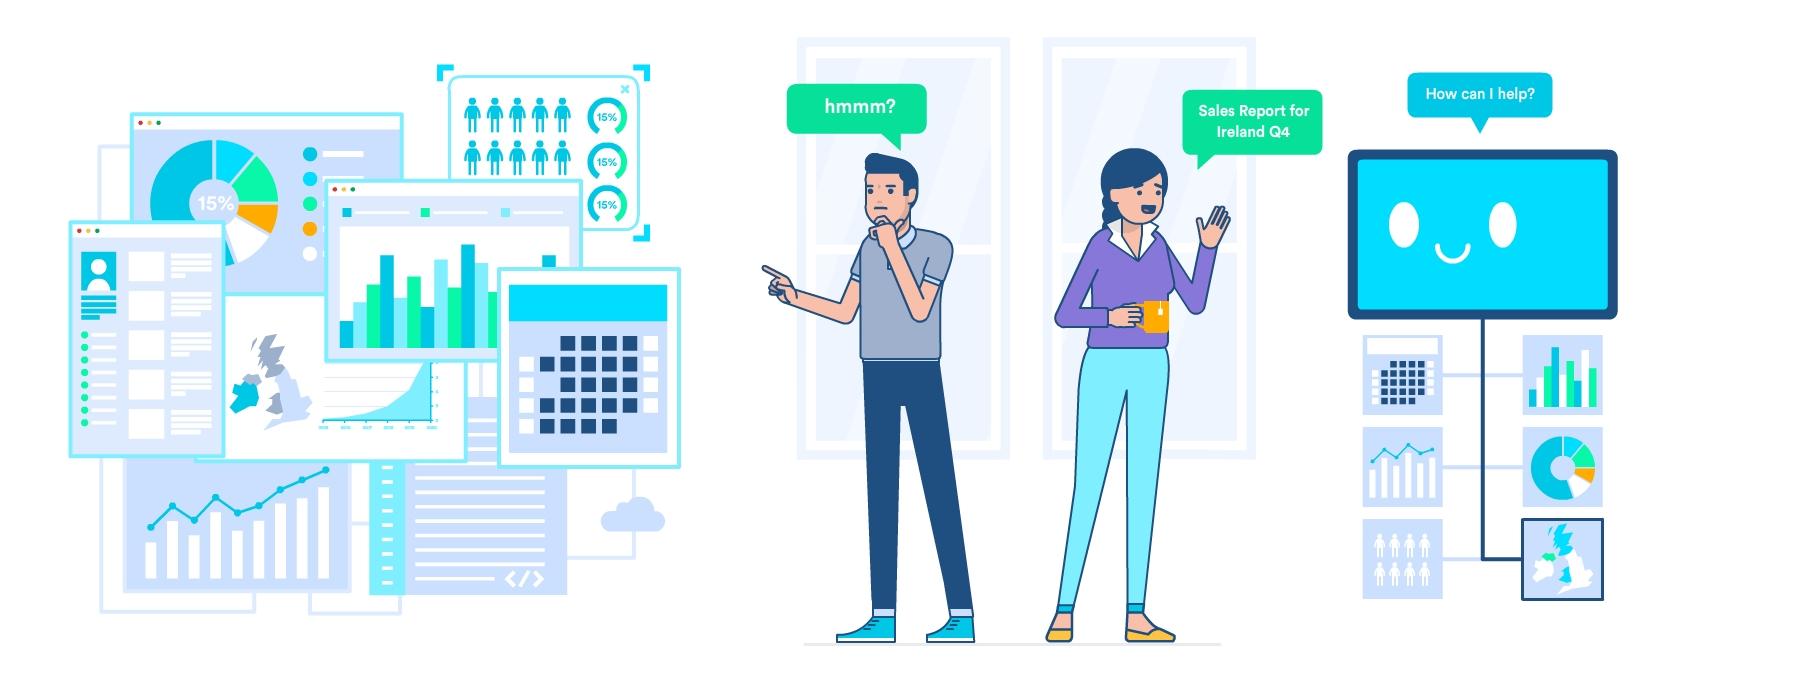 Enterprise virtual assistants: going beyond the chatbot